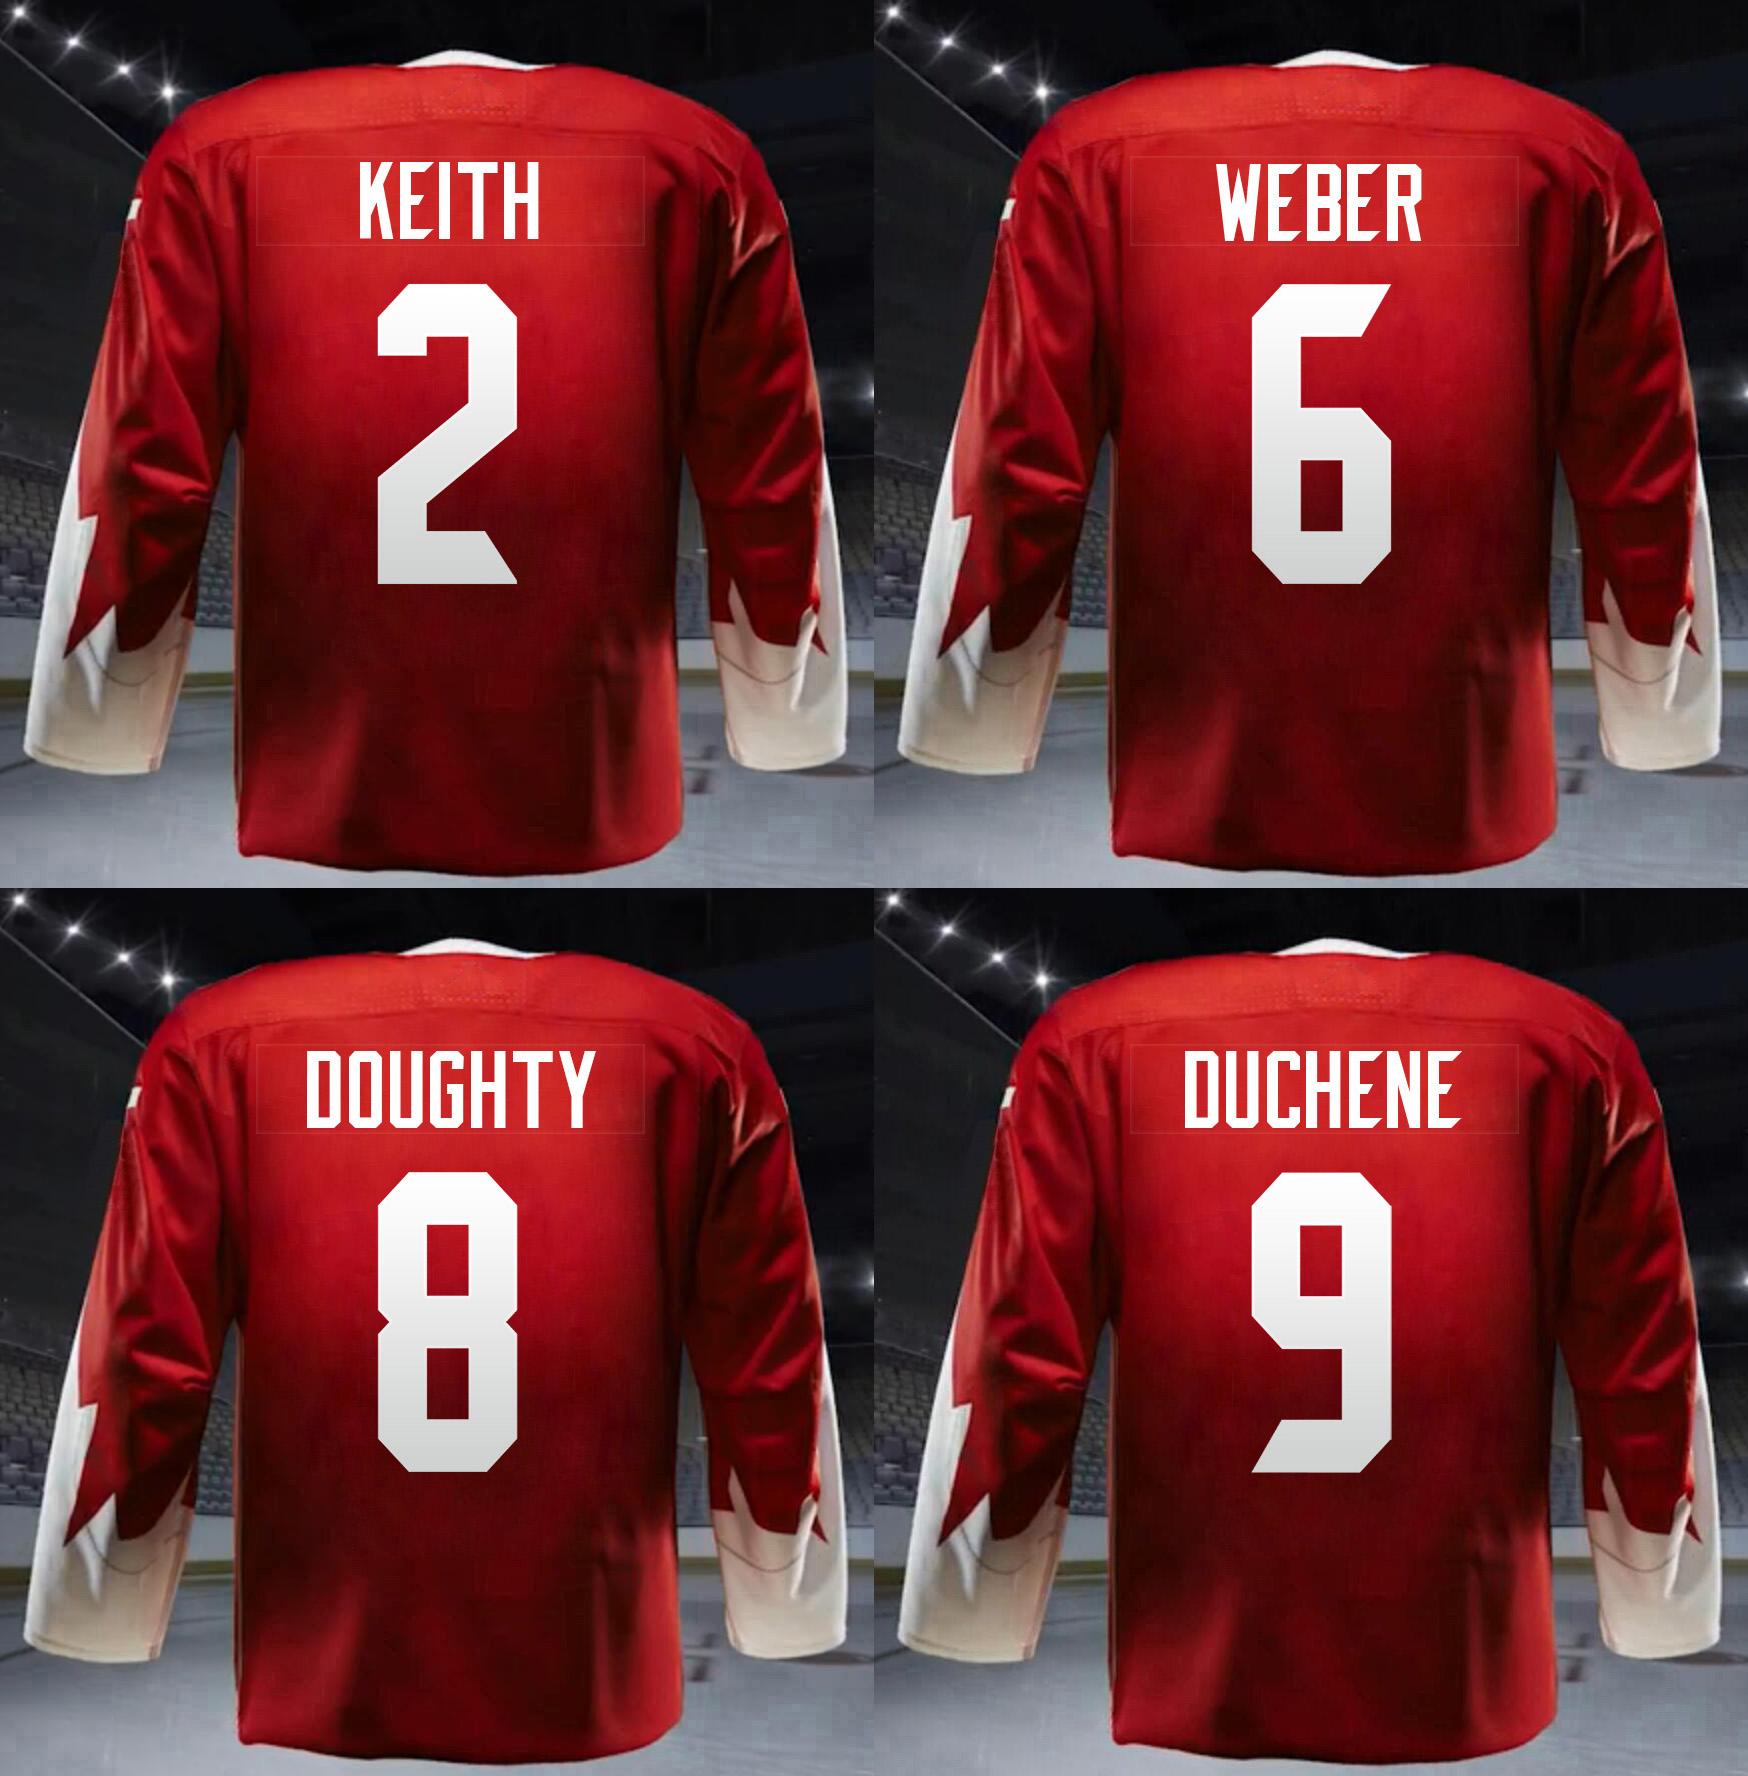 2016 WCH Duncan Keith,Shea Weber,Drew Doughty,Matt Duchene Jersey Stitched Canada Jersey(China (Mainland))